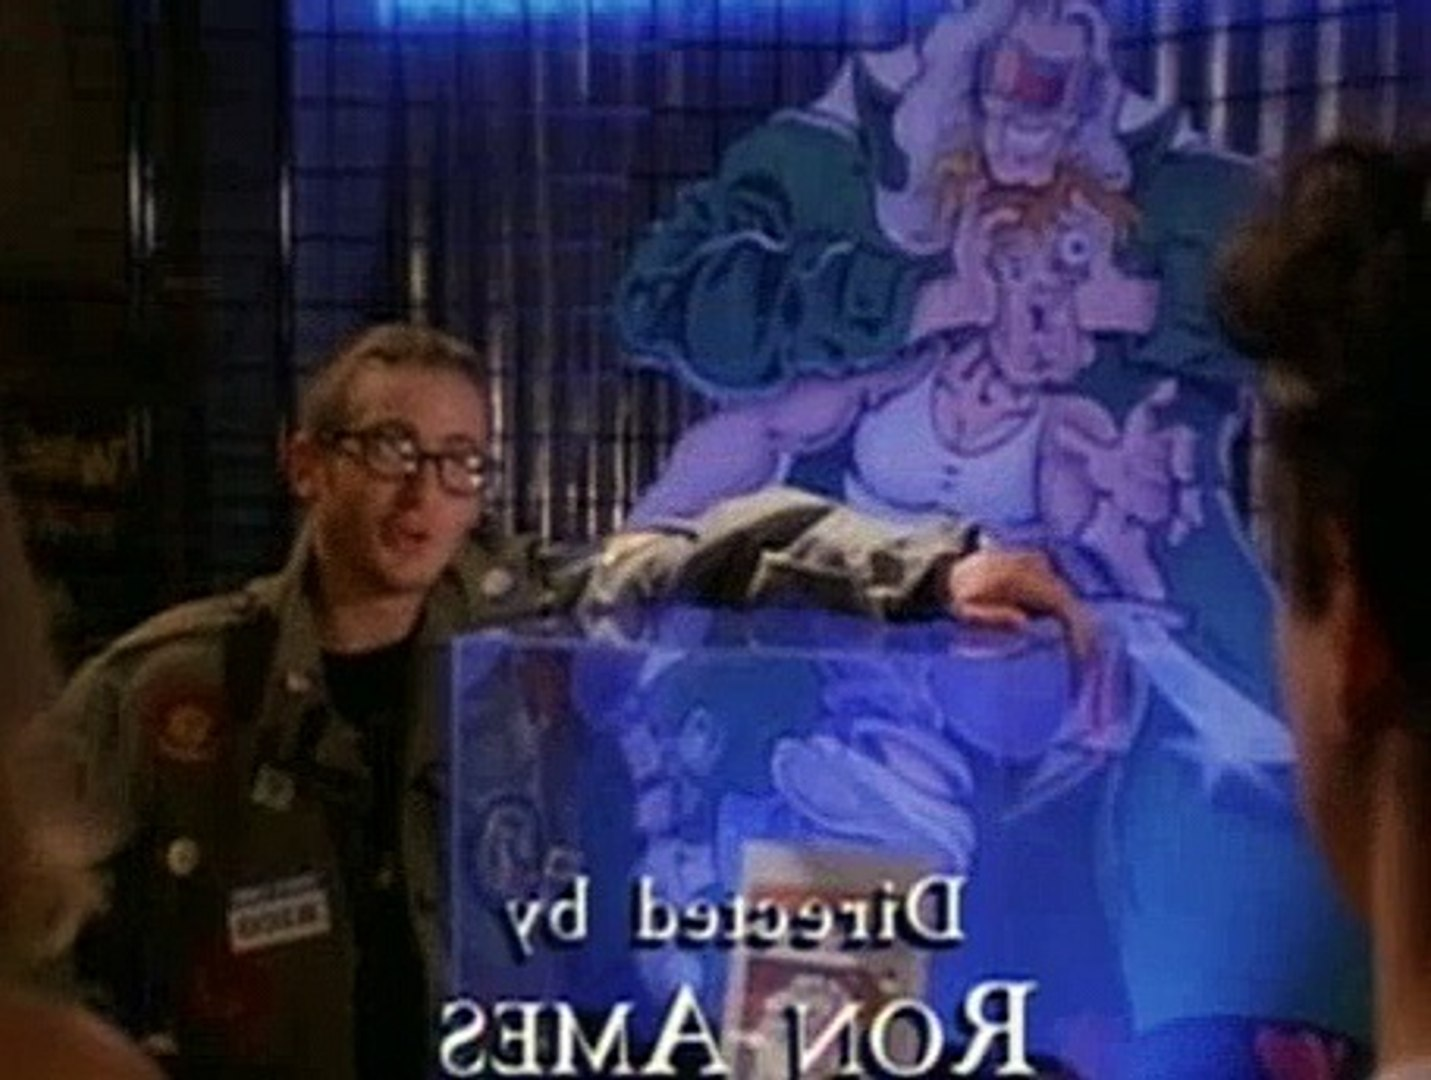 Weird Science Season 3 Episode 13 - Quantum Wyatt